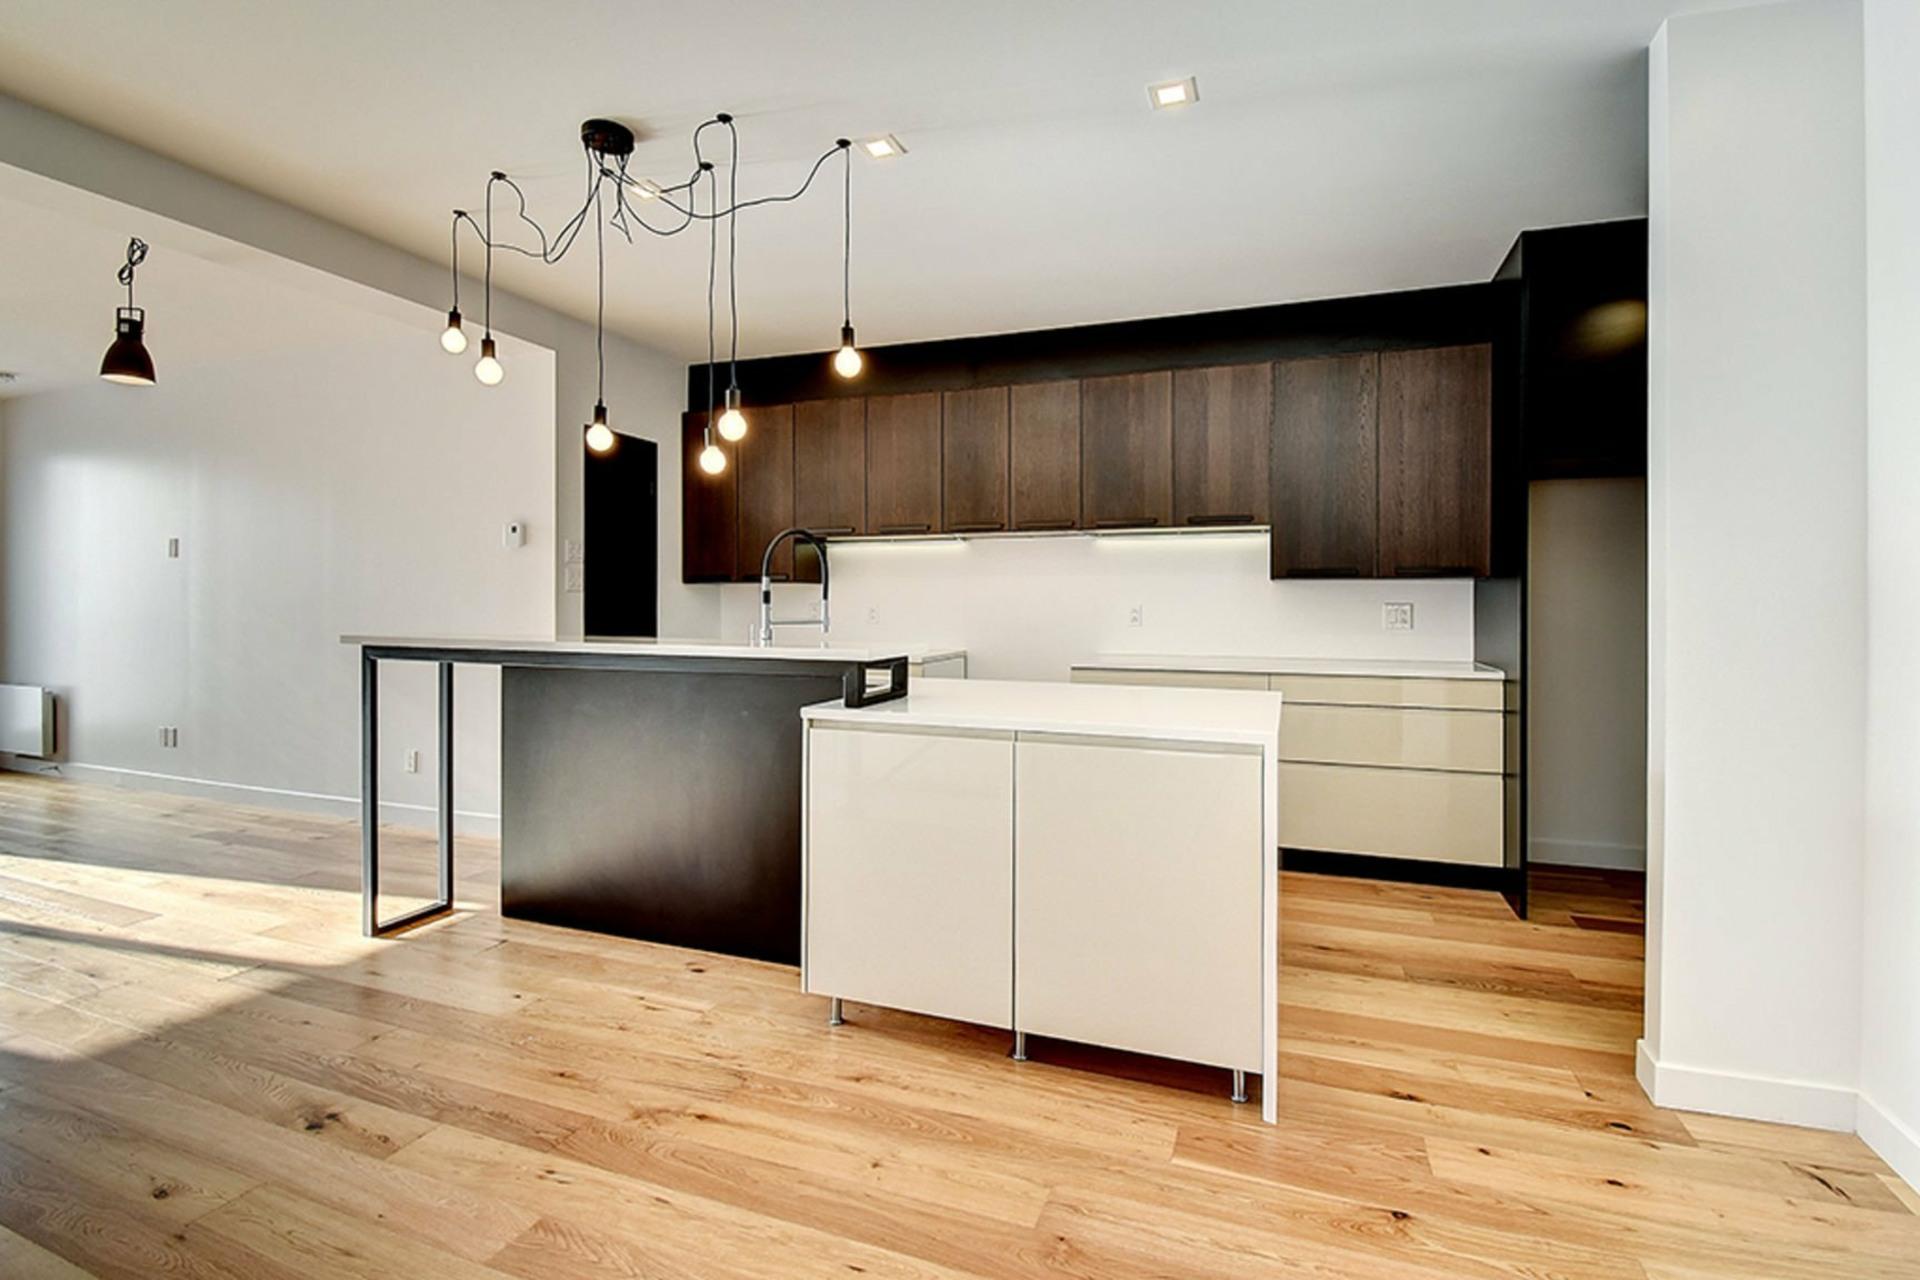 image 7 - Apartment For sale Le Vieux-Longueuil Longueuil  - 9 rooms